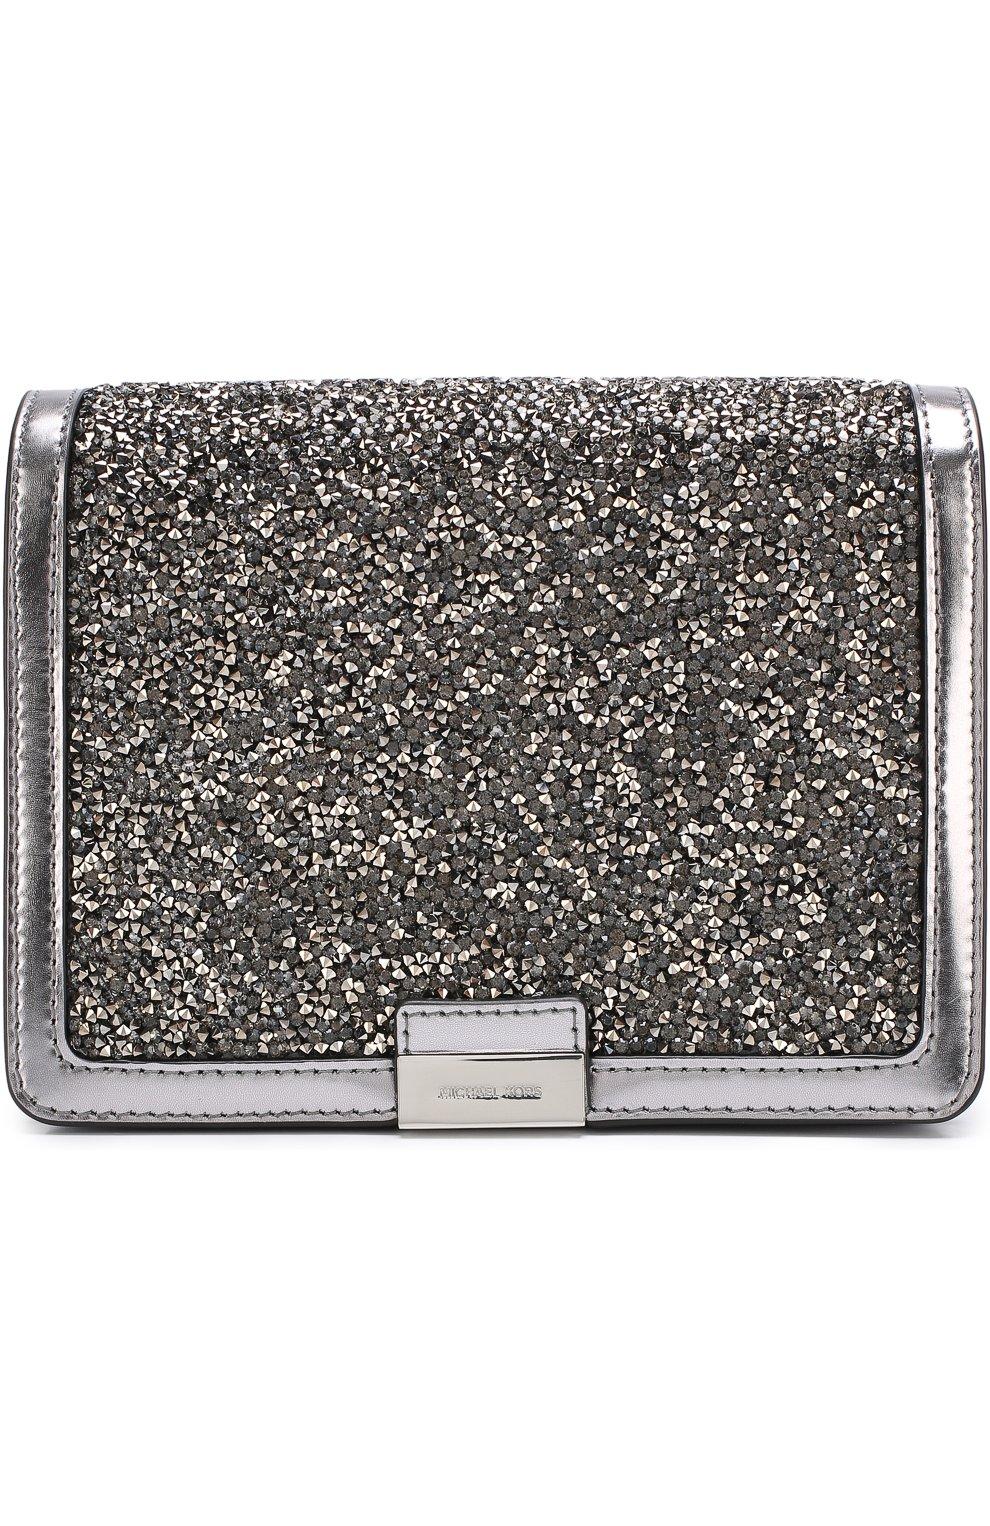 85208fa9aeda Сумка Jade с глиттером MICHAEL Michael Kors серебряного цвета | Фото №1